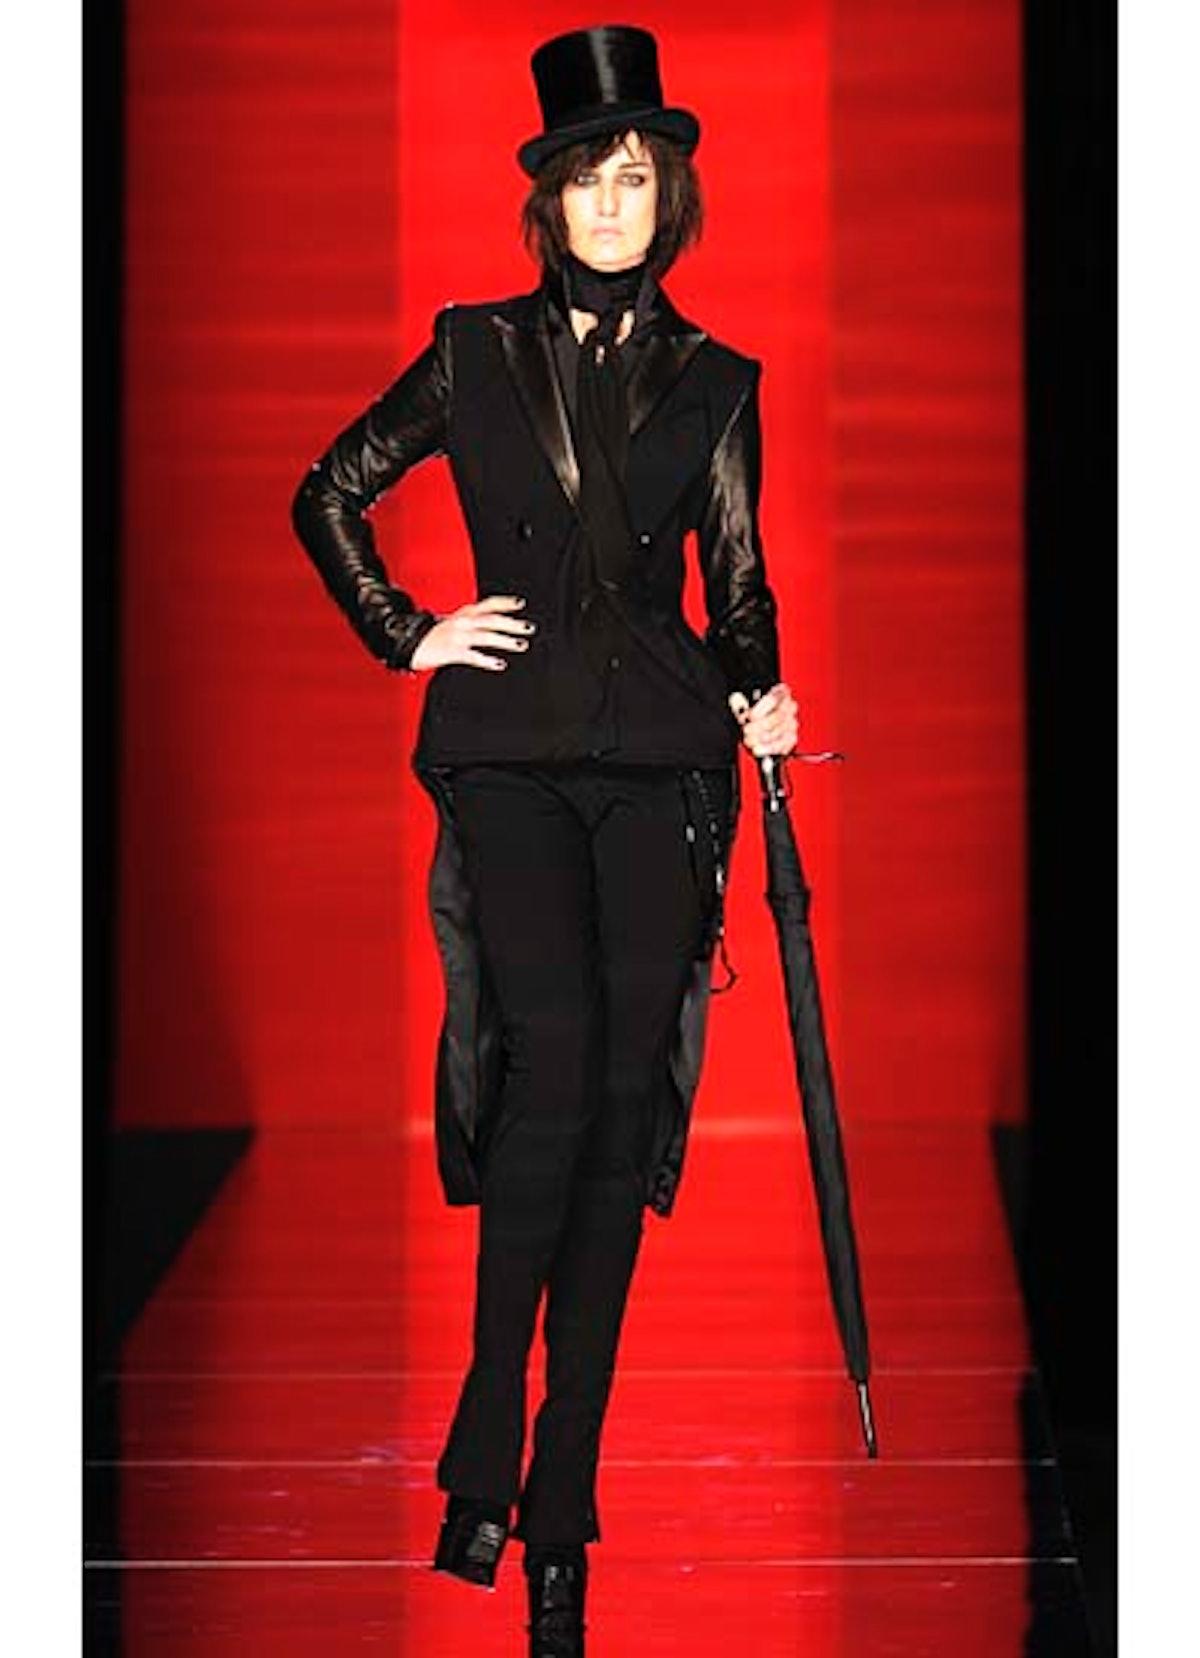 fass-jean-paul-gaultier-couture-2012-runway-01-v.jpg